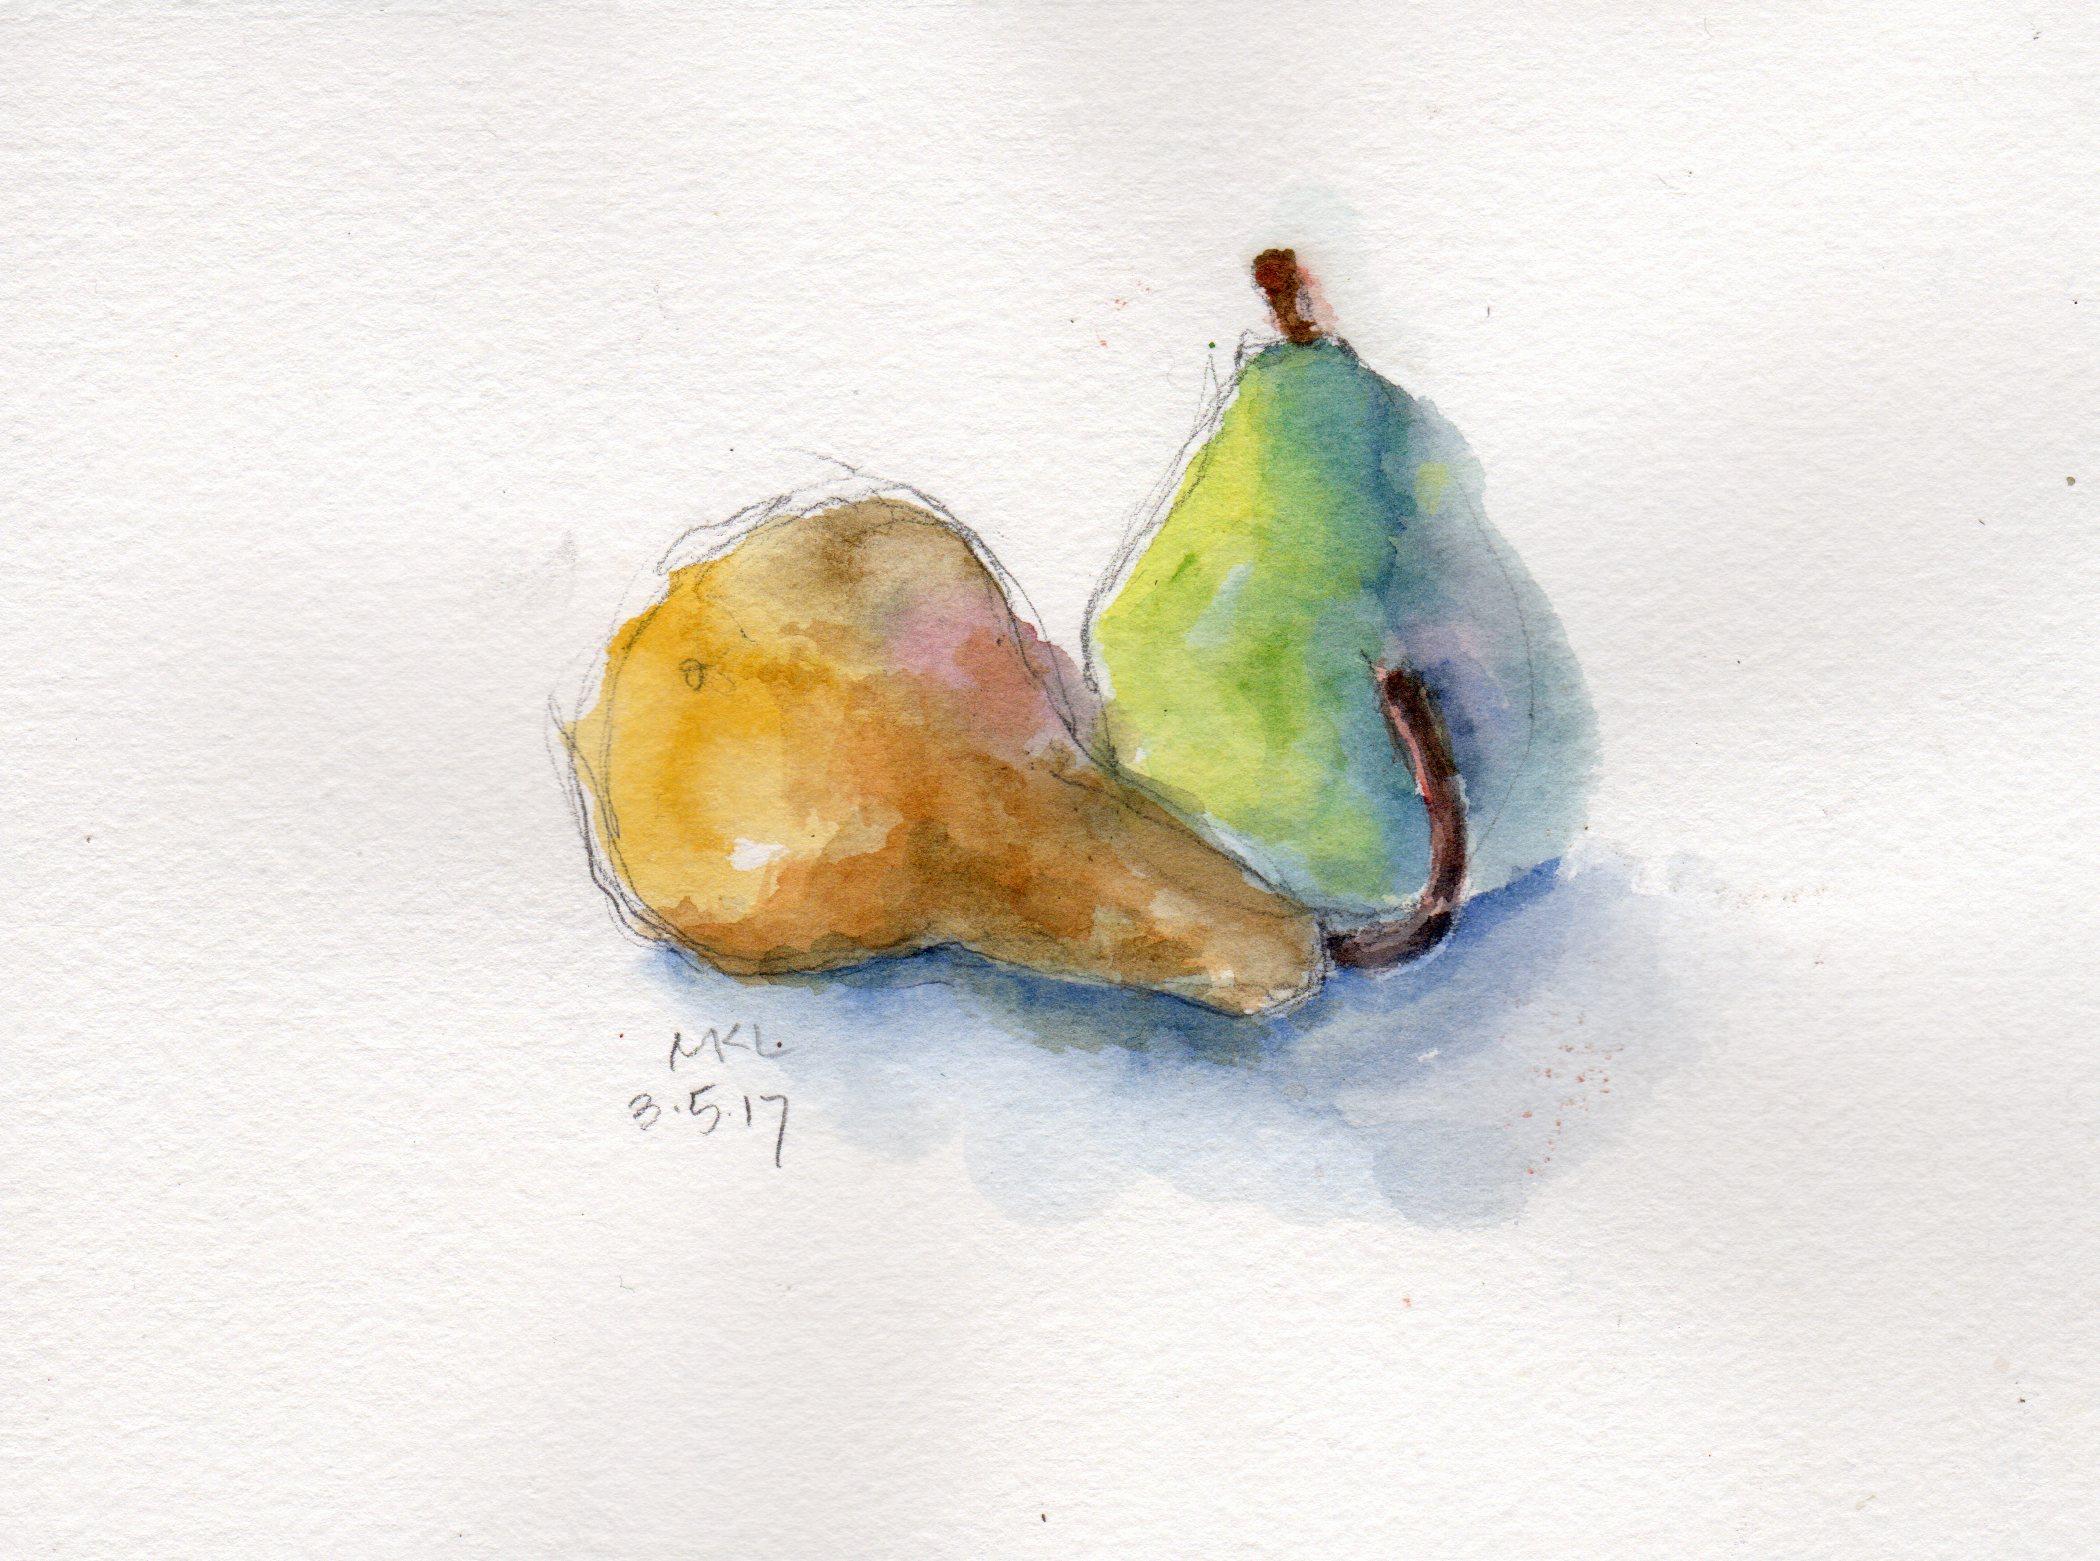 2017_3 Pears